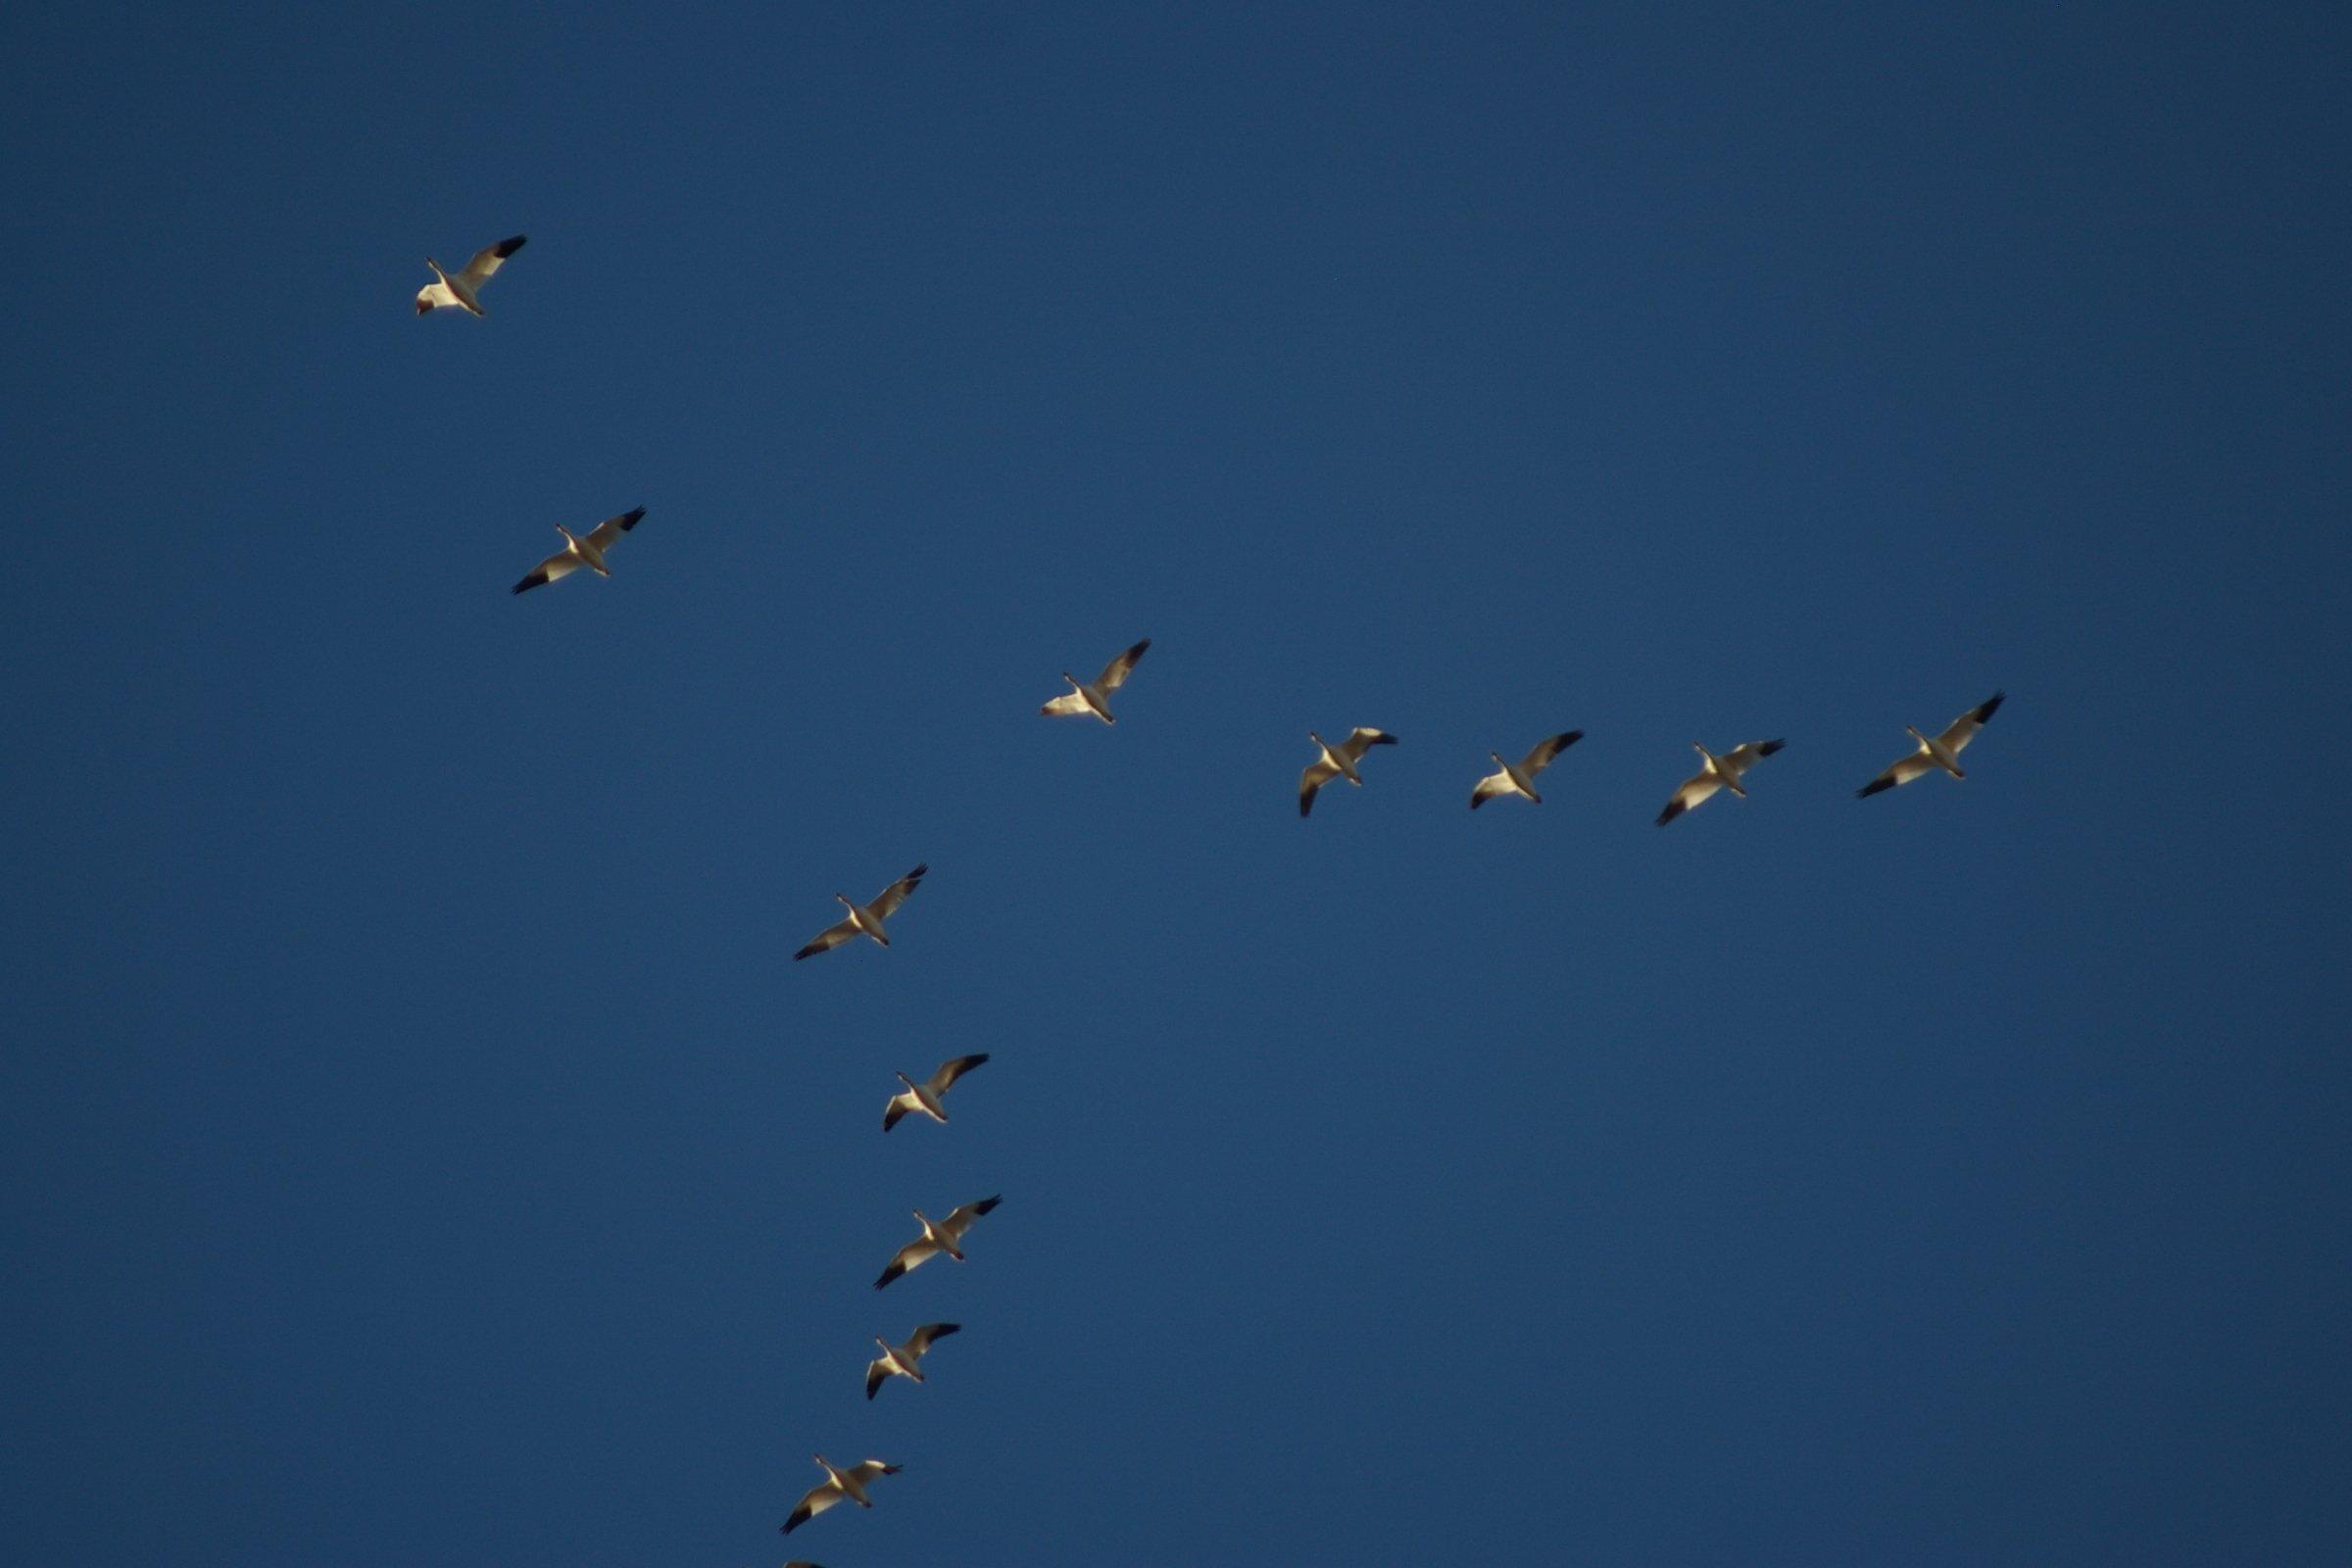 Vol d'oiseaux en formation